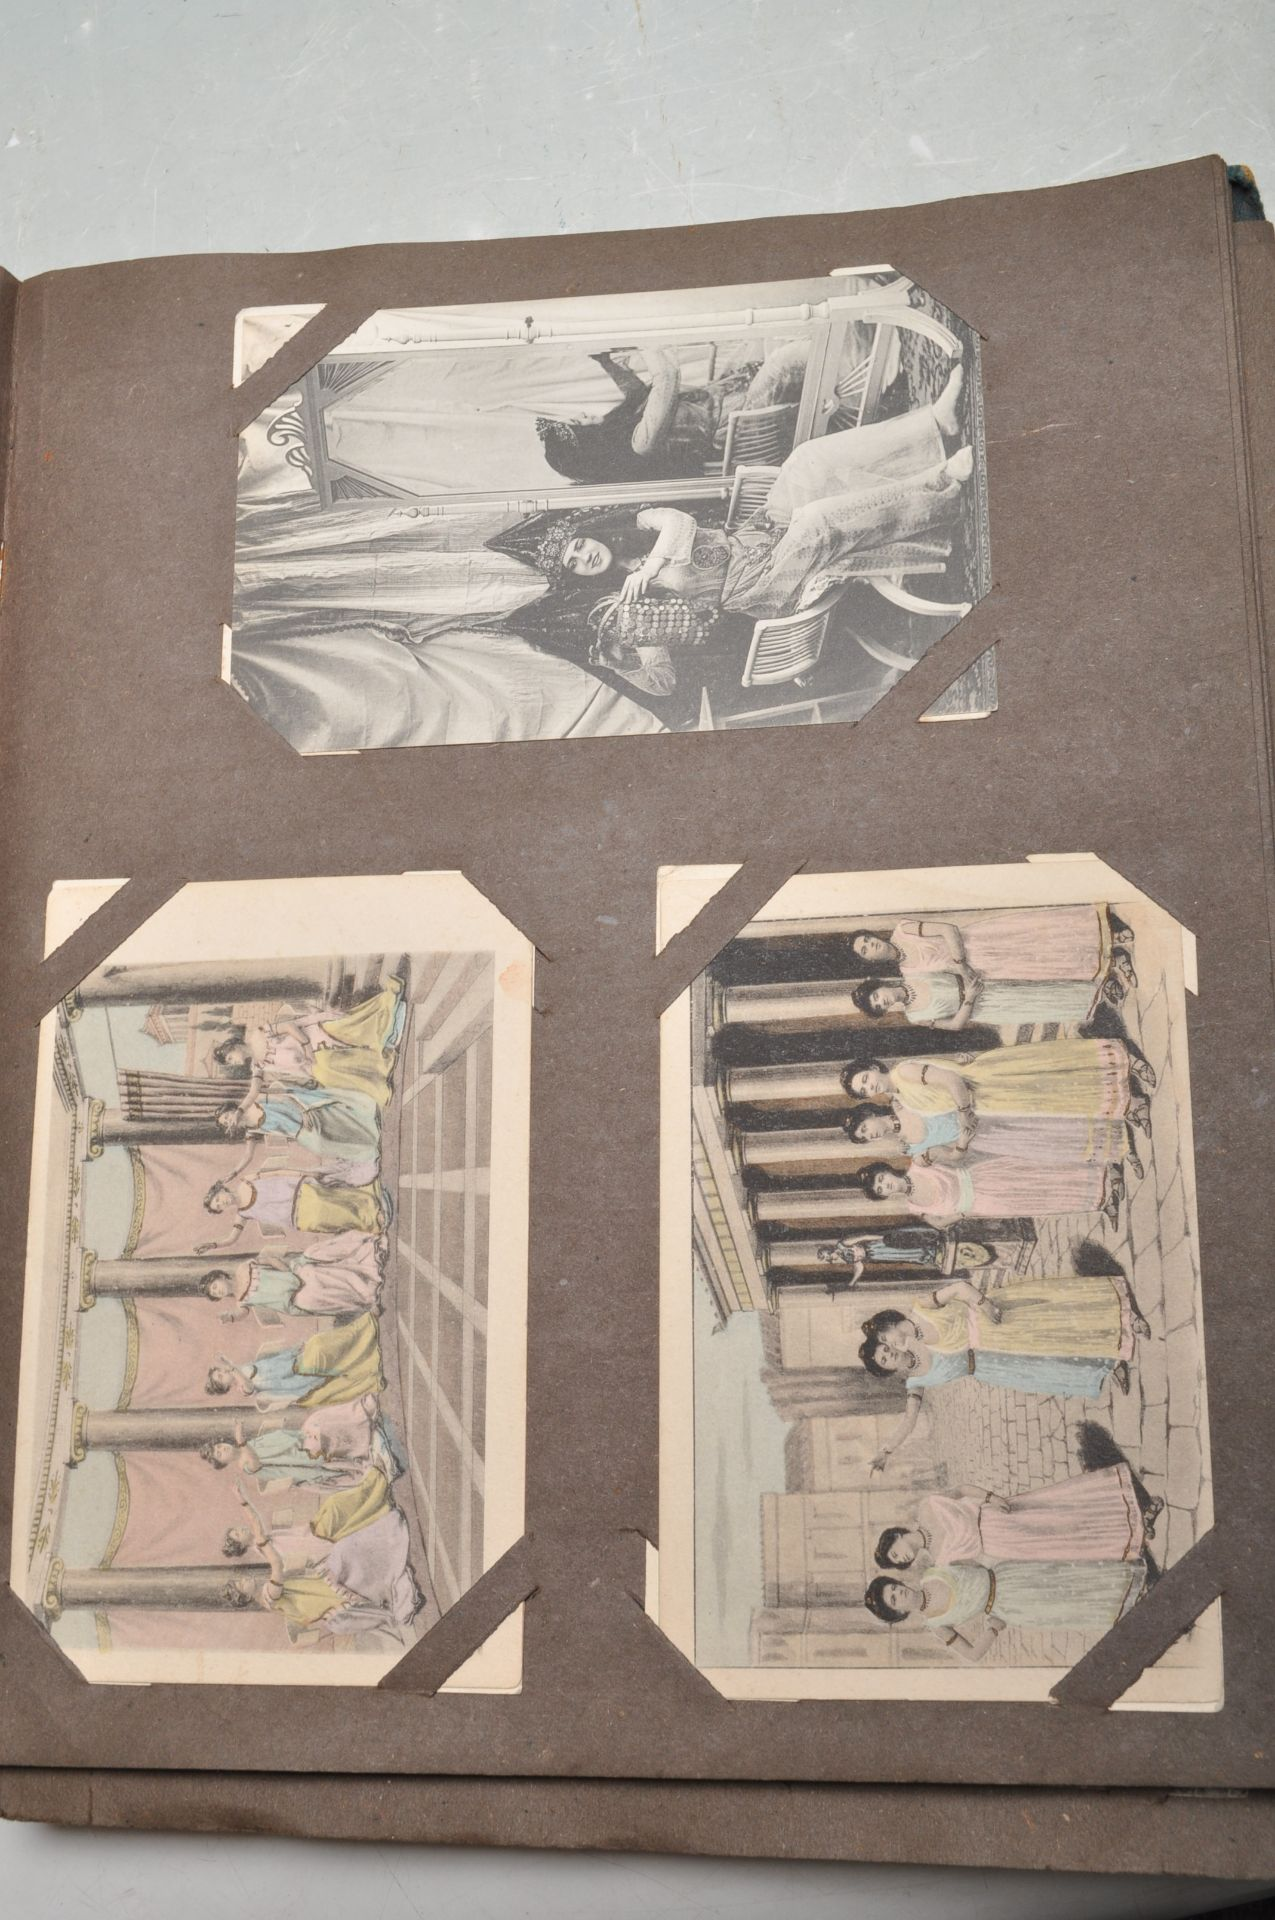 ALBUM OF FOREIGN POSTCARDS - ALL CIRCA WW1 PERIOD - Bild 23 aus 23